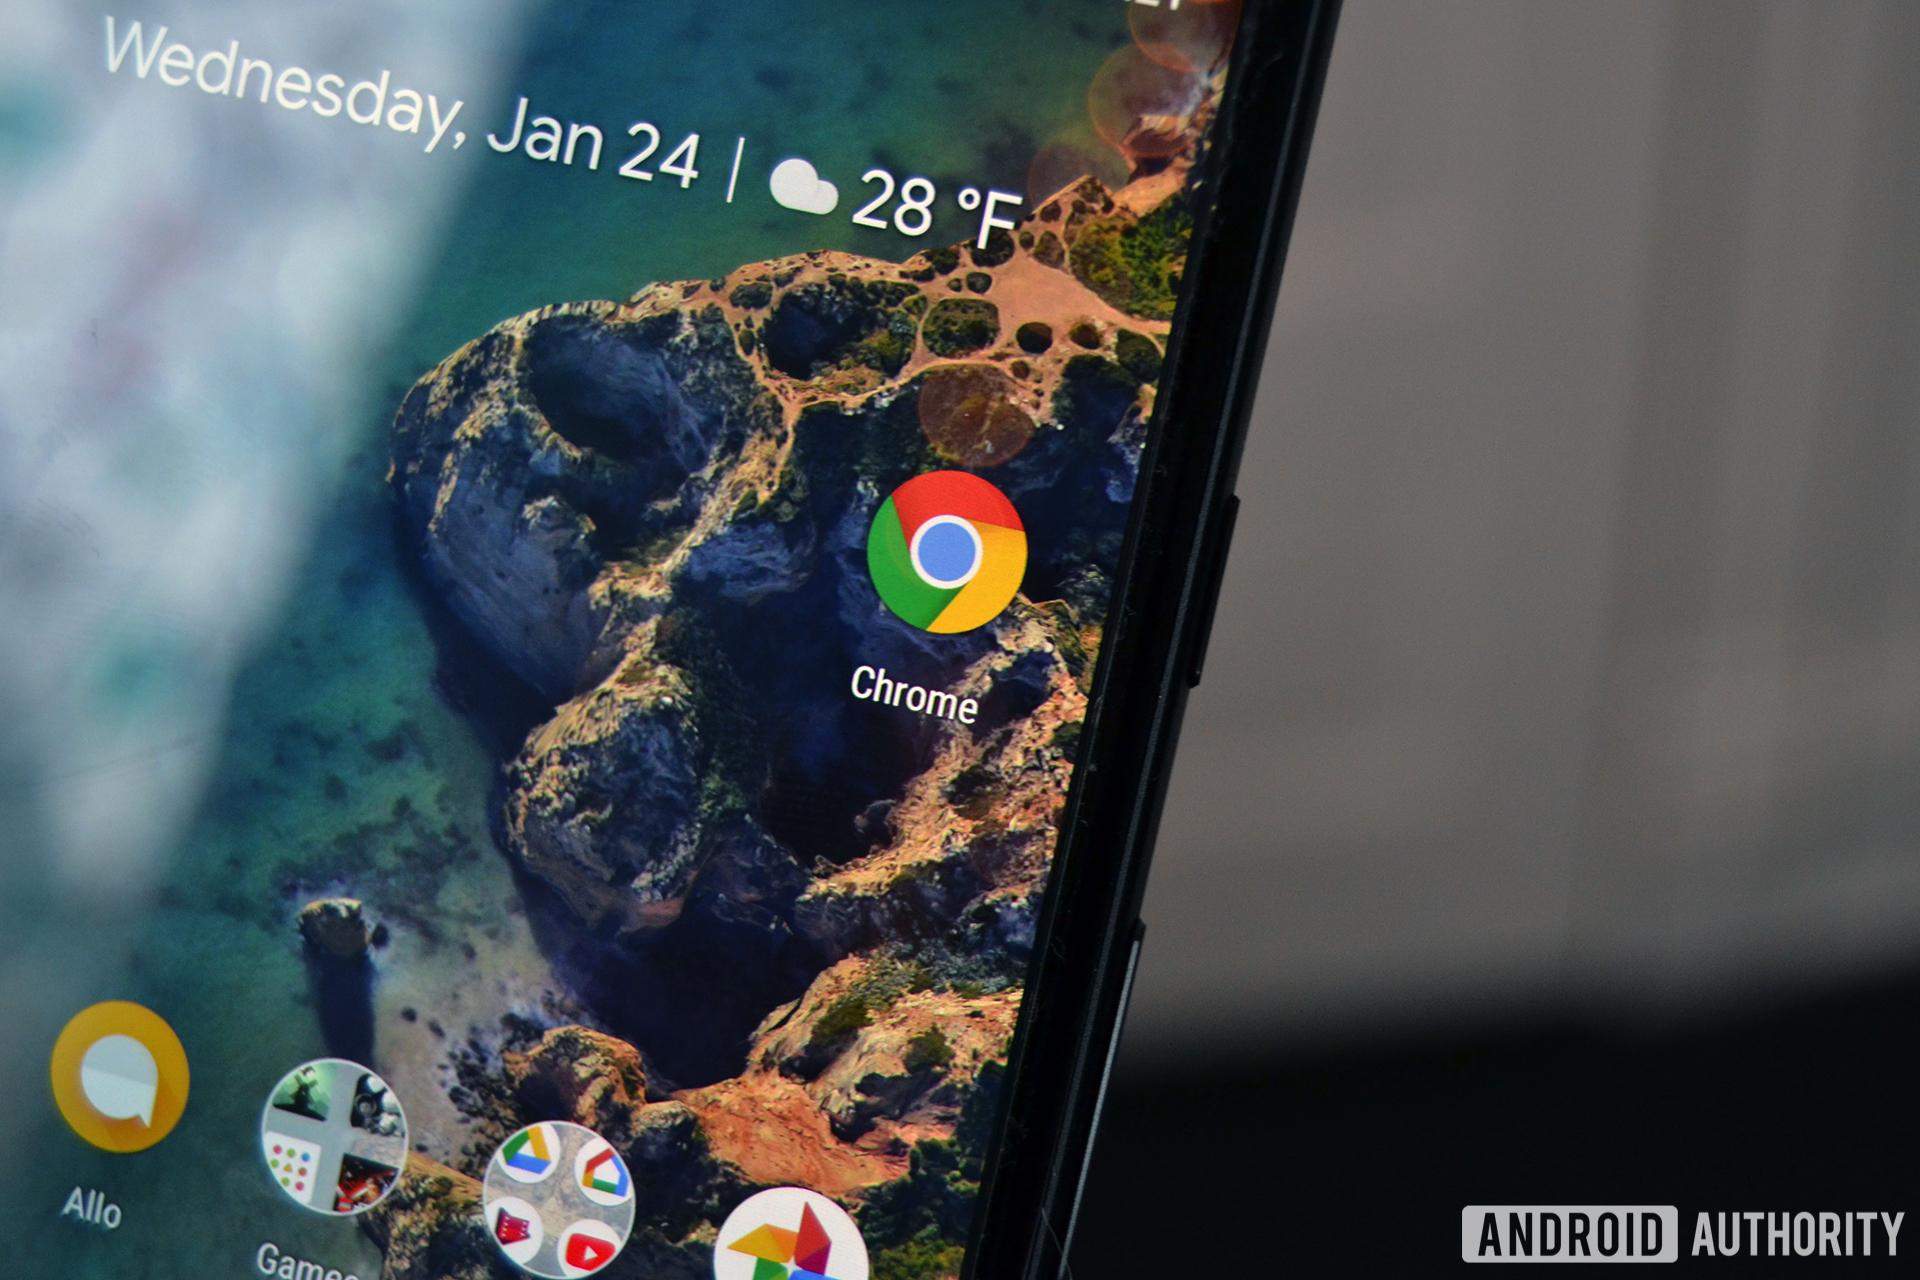 Google Chrome on the Google Pixel 2 XL.